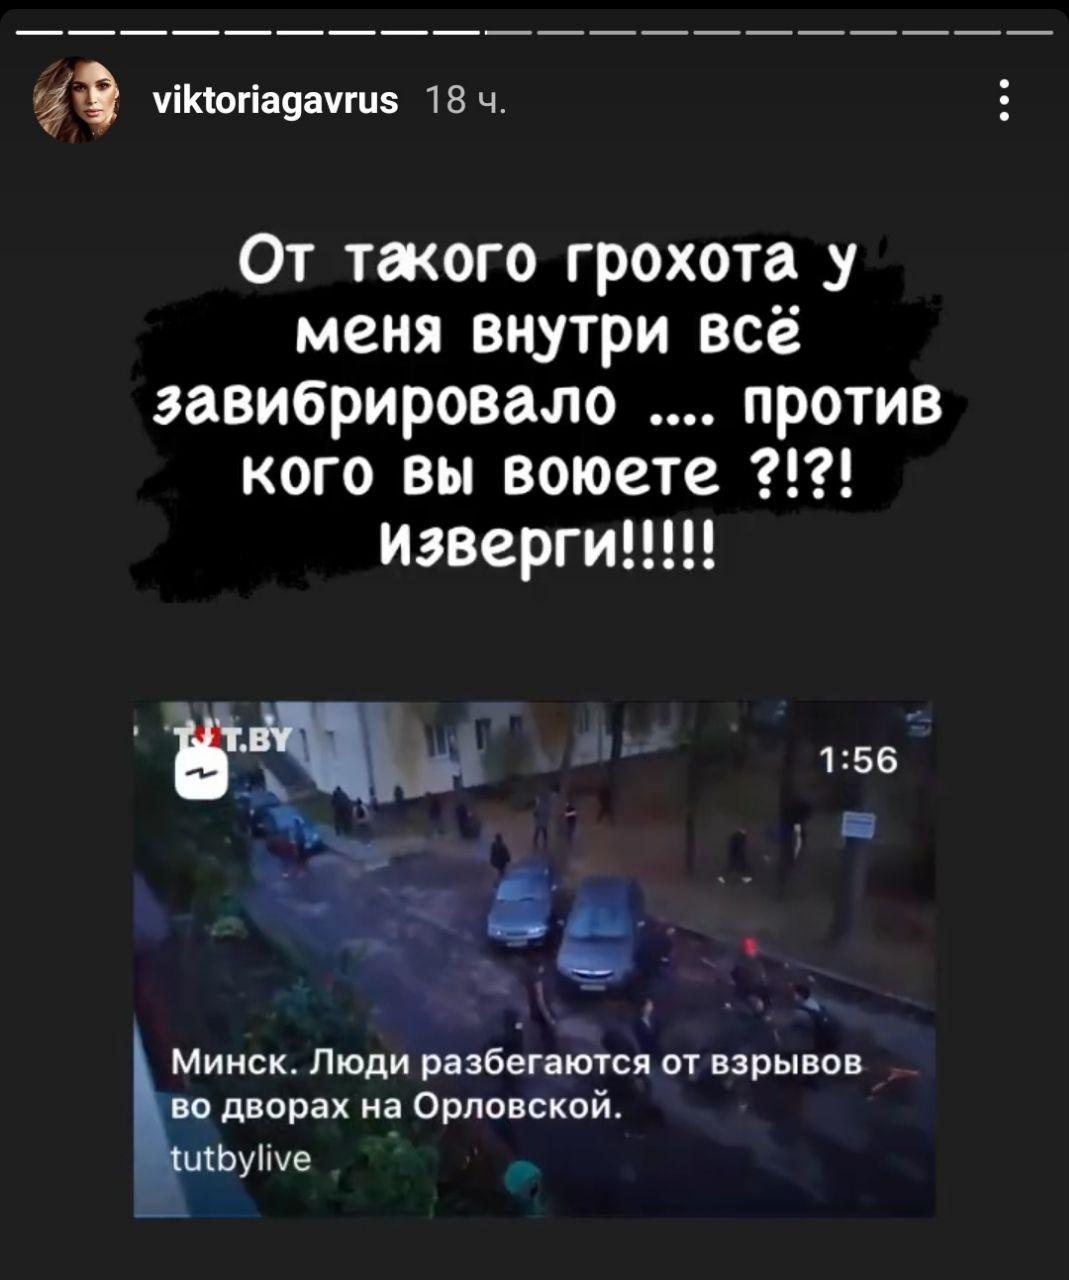 https://s5o.ru/storage/dumpster/a/bf/c64d395eb233bd6c3a76ca5d84dac.JPG